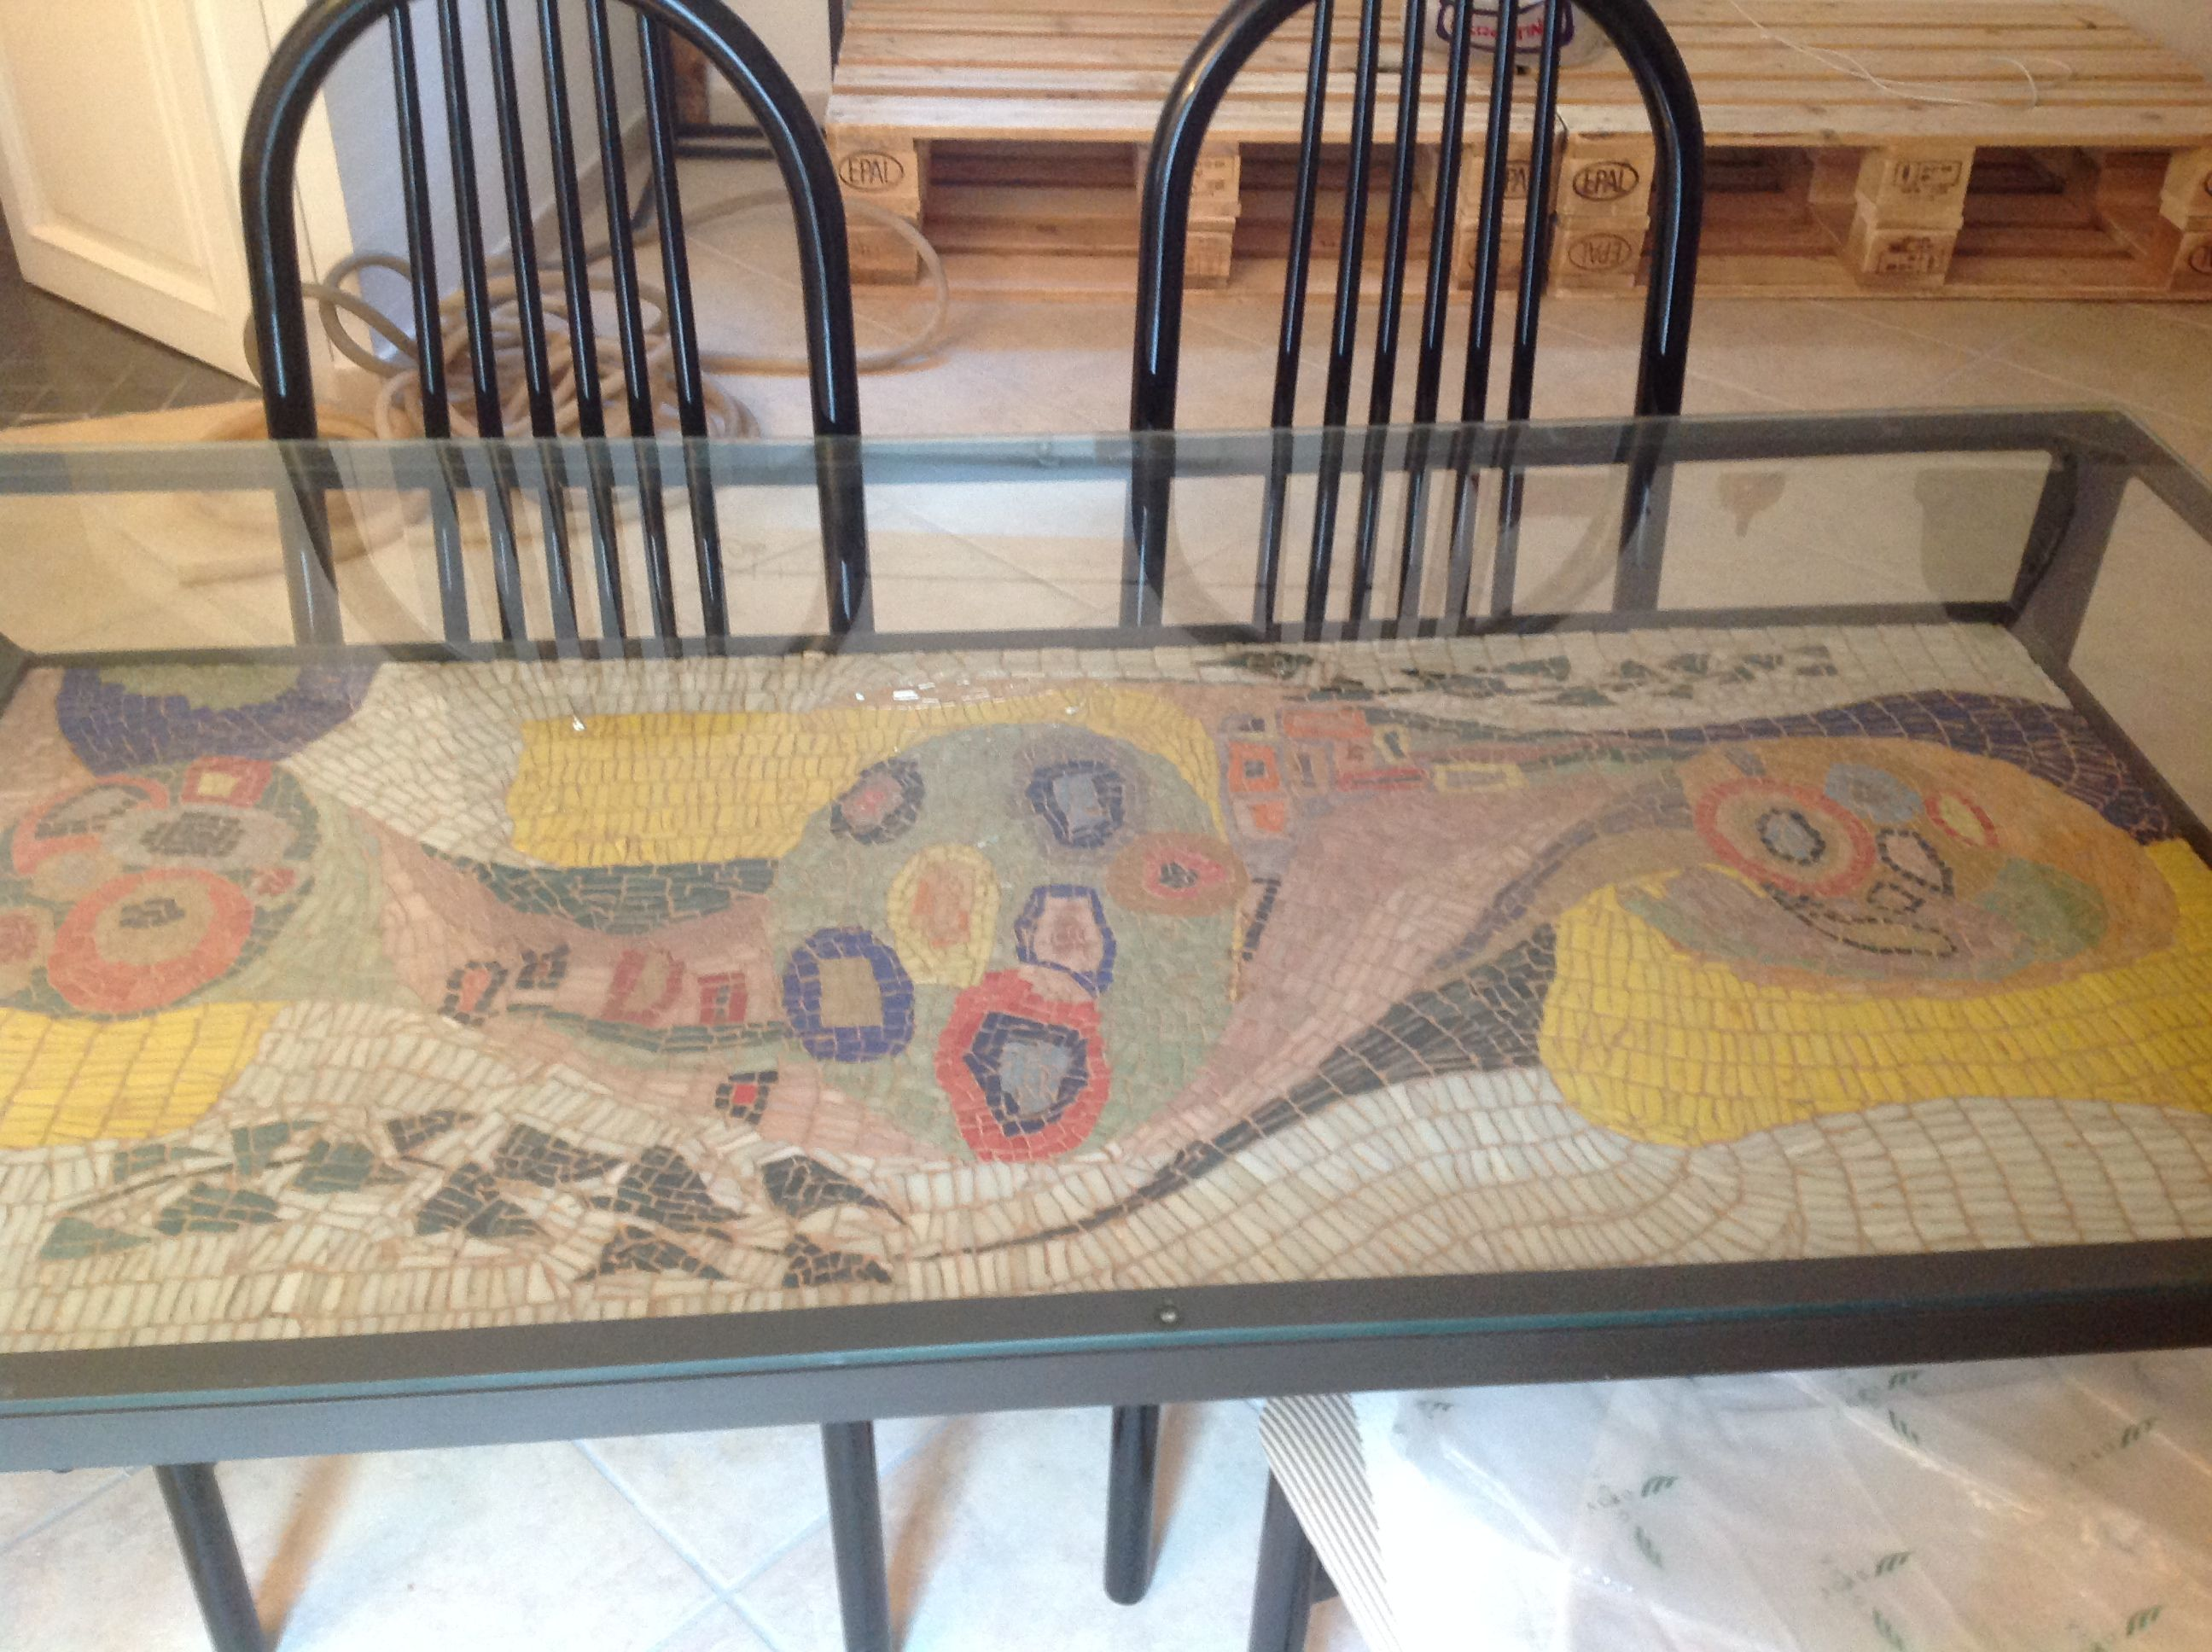 Tavolo Mosaico ~ Mosaic table top big size by il fauno mosaici tavoloinmosaico